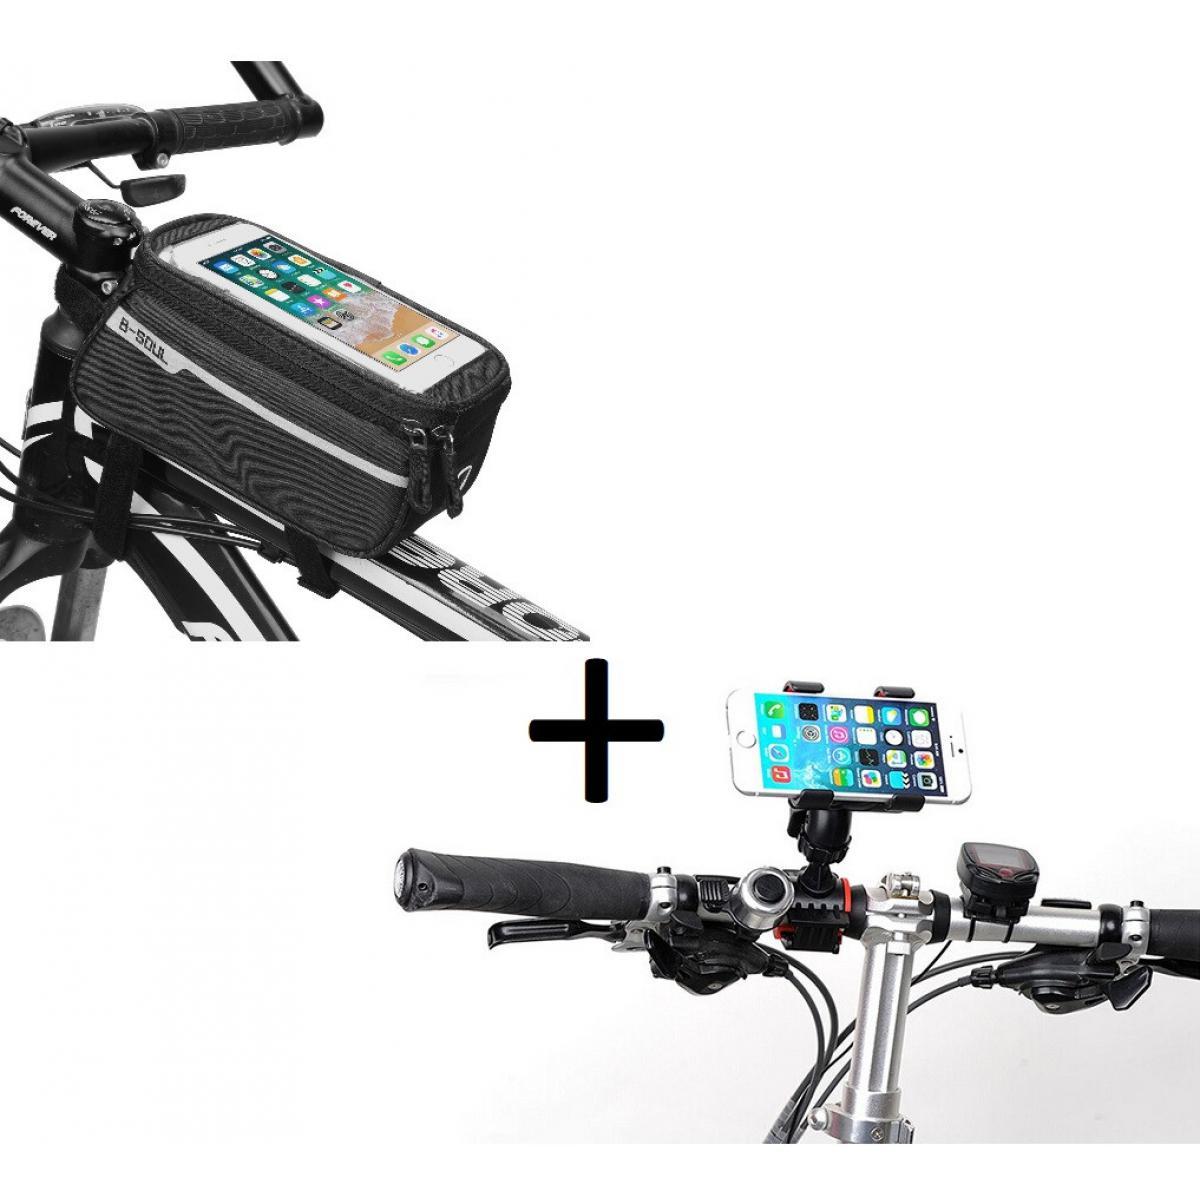 Shot Pack Velo pour OPPO Find X2 Neo Smartphone (Support Velo Guidon + Pochette Tactile) VTT Cyclisme (NOIR)